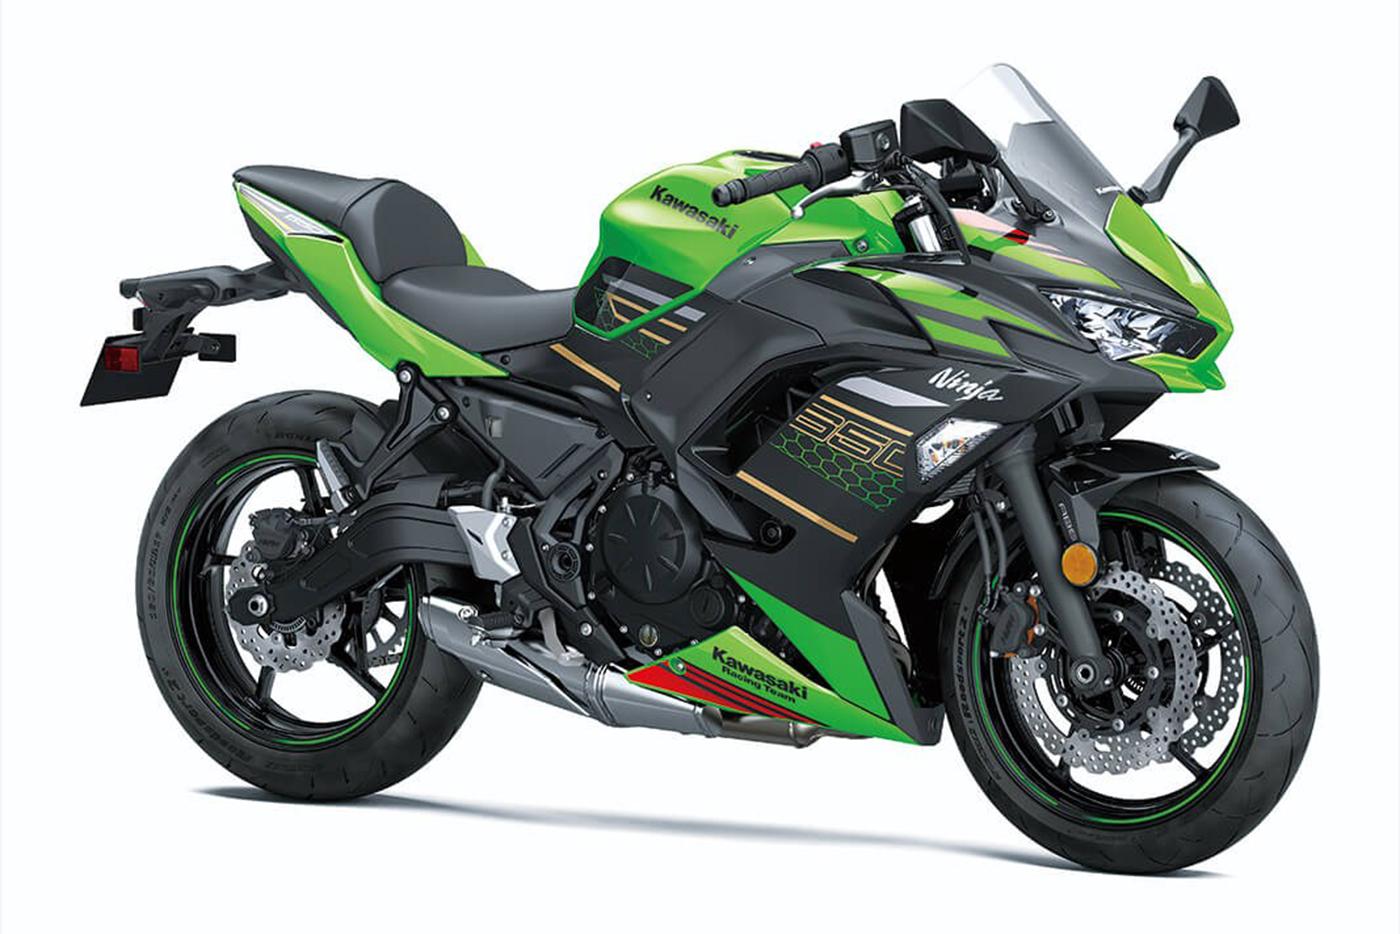 2020-kawasaki-ninja-650-18.jpg